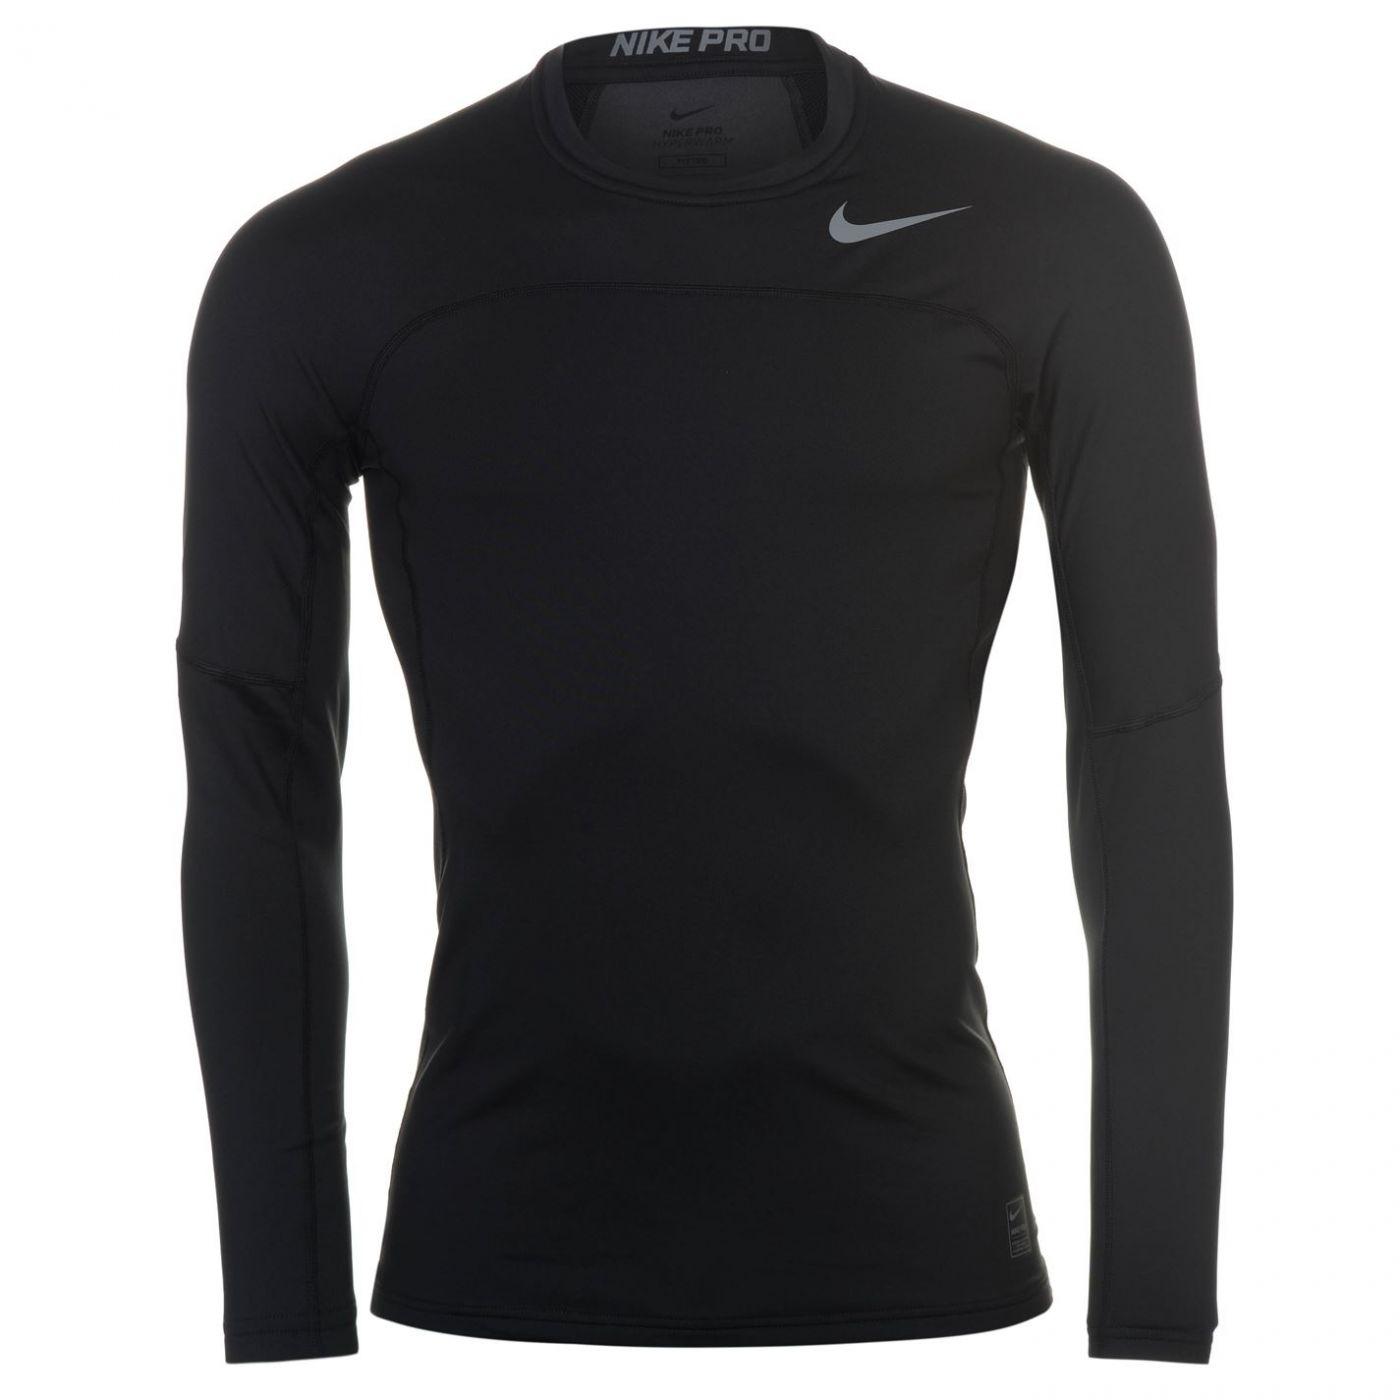 a23c041aaa1 Nike Hyperwarm Long Sleeve Base Layer Top Mens - FACTCOOL